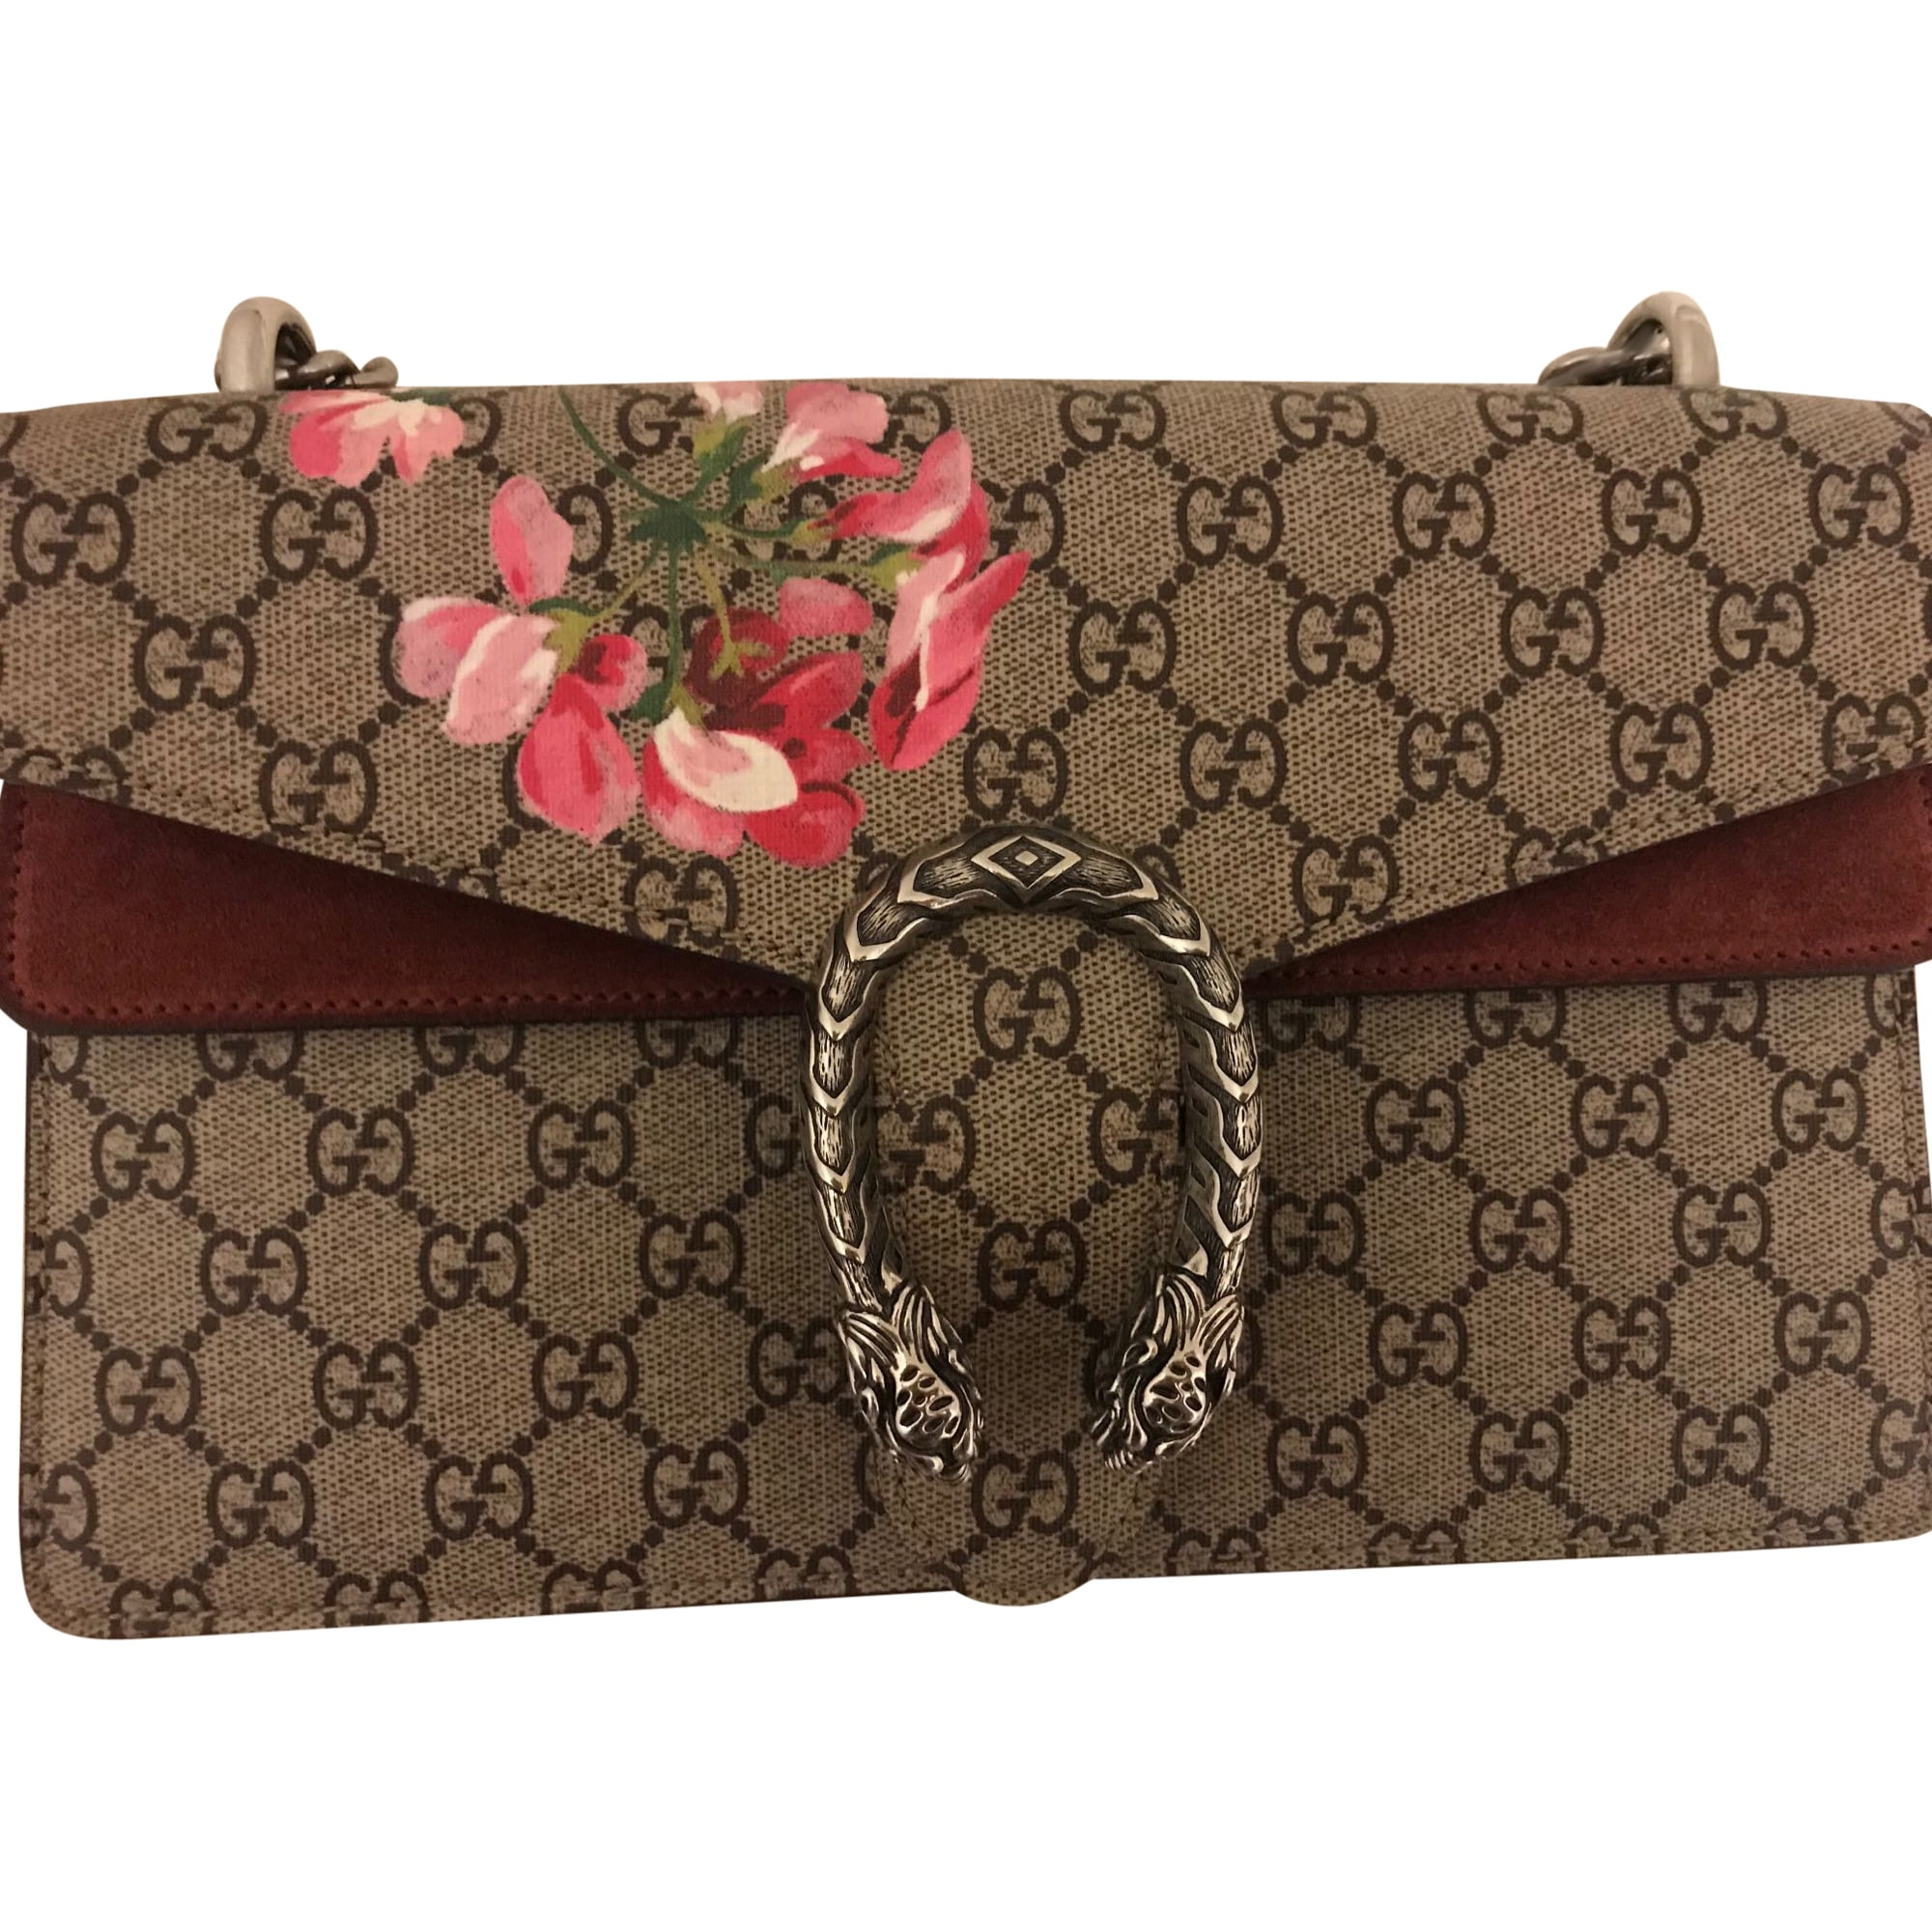 Non-Leather Handbag GUCCI Dionysus Pink, fuchsia, light pink